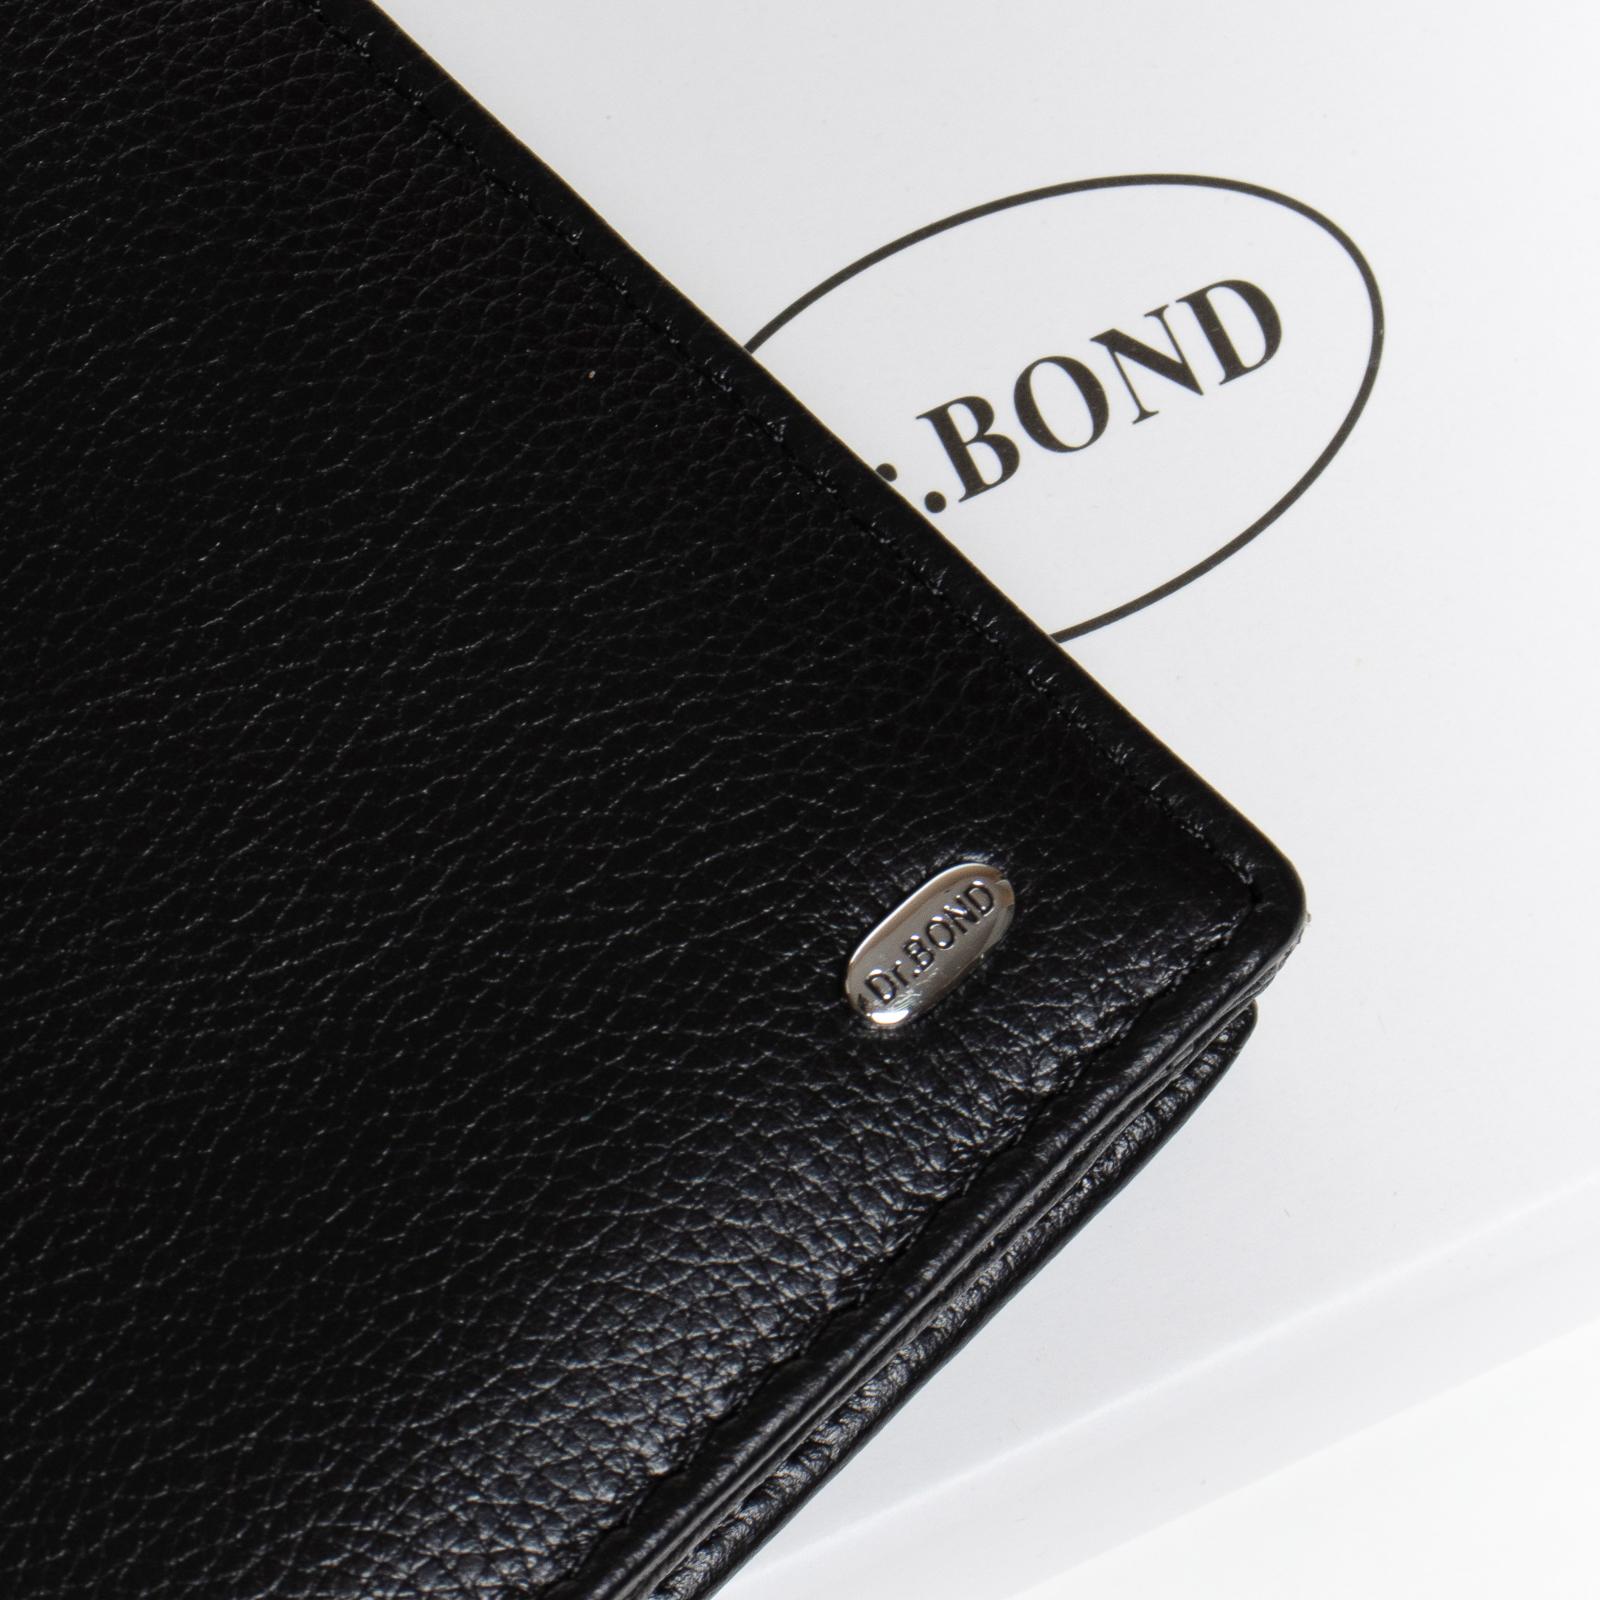 Кошелек Classic кожа DR. BOND WMB-3M black color - фото 3